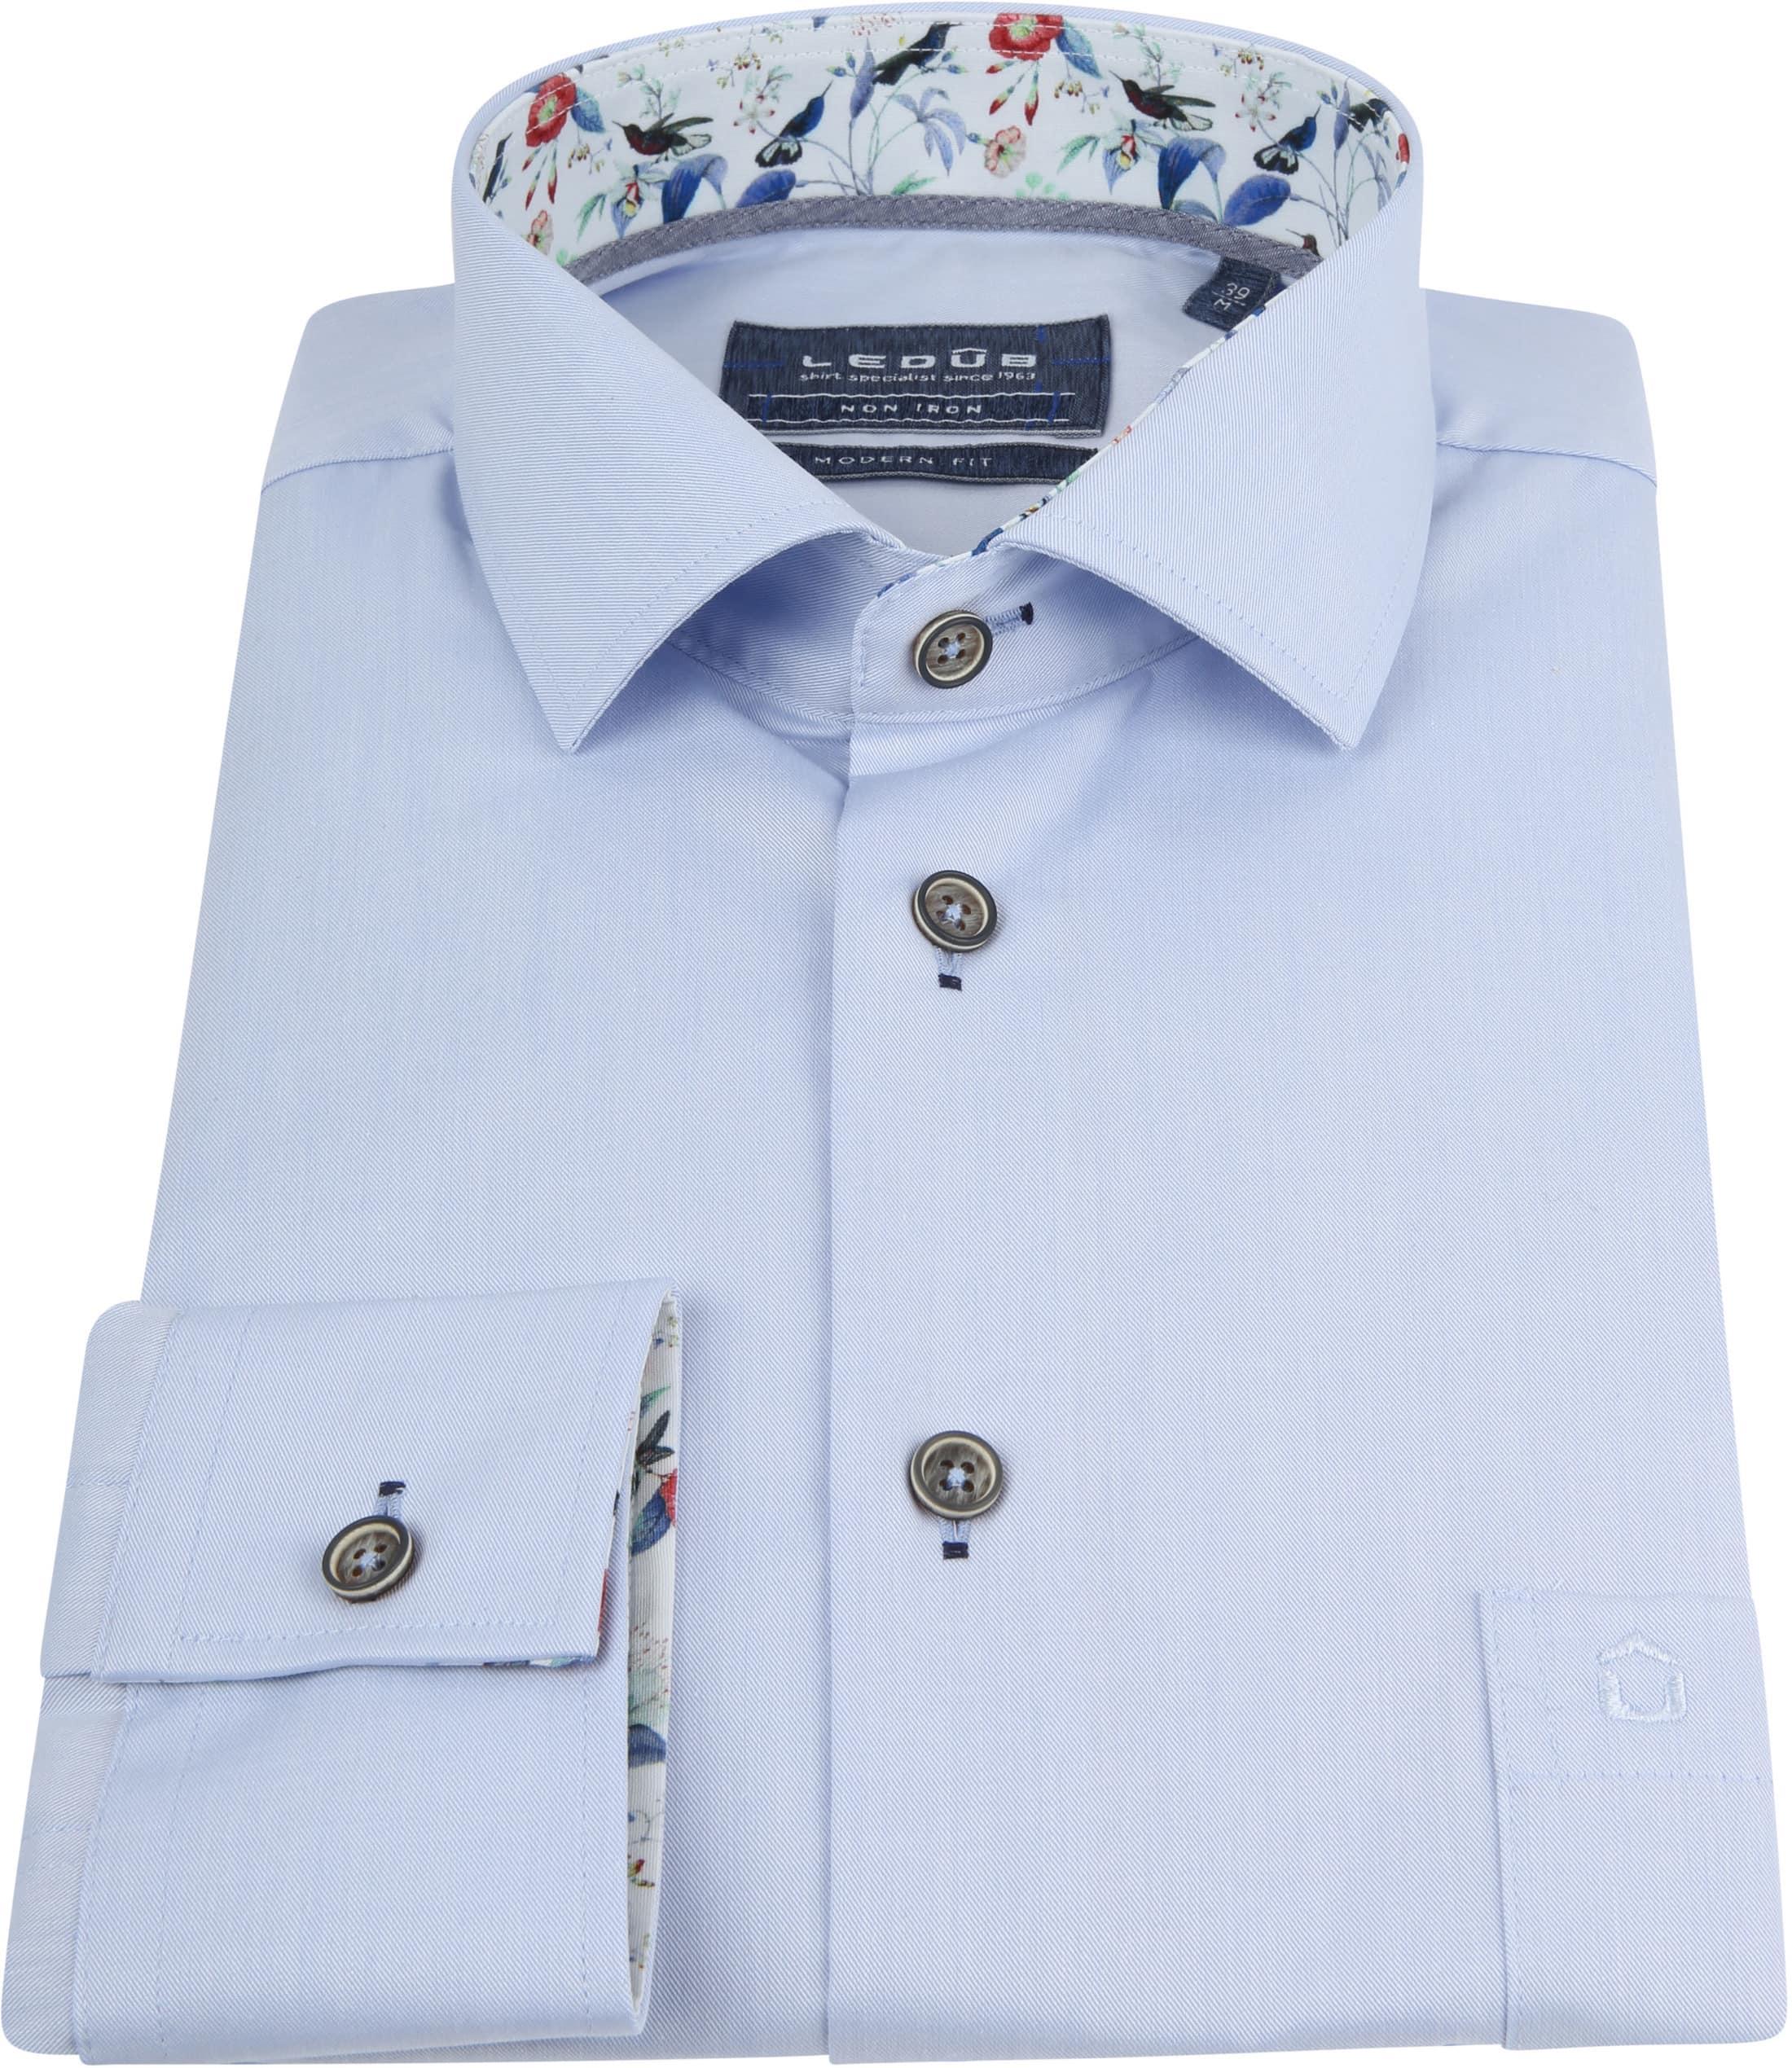 Ledub Overhemd Non Iron MF Blauw foto 2